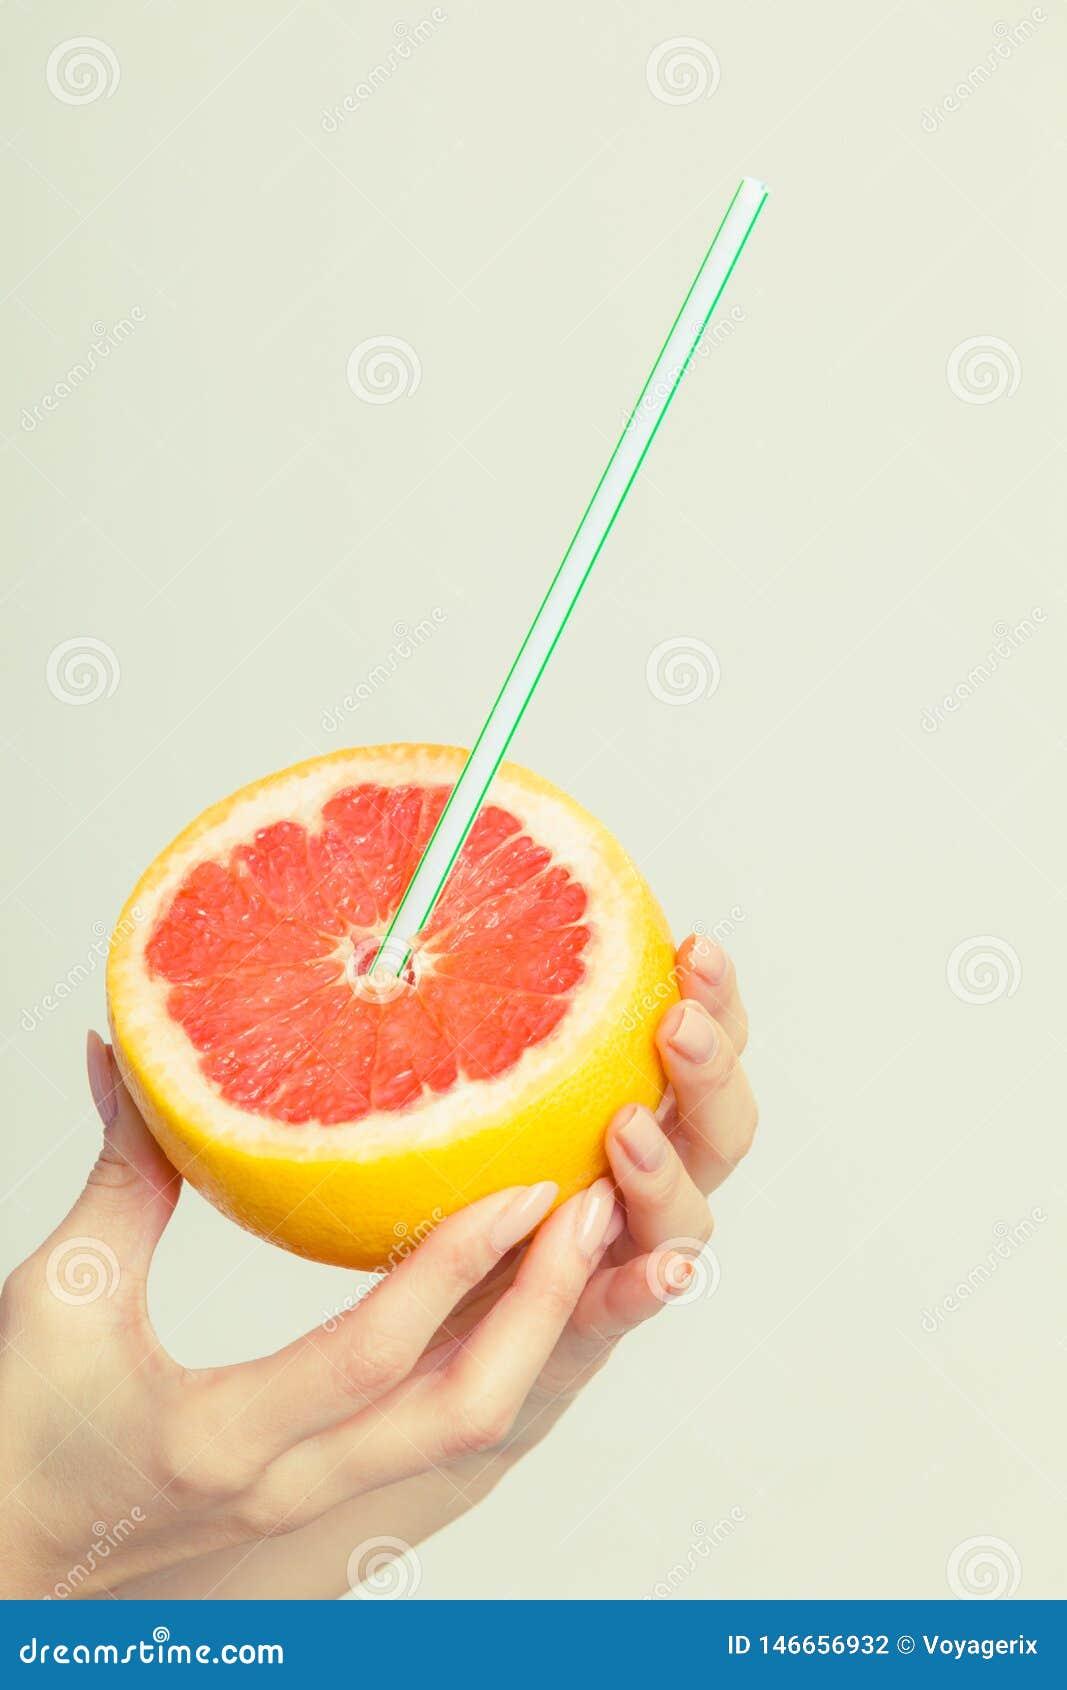 Summer healthy fruit drink